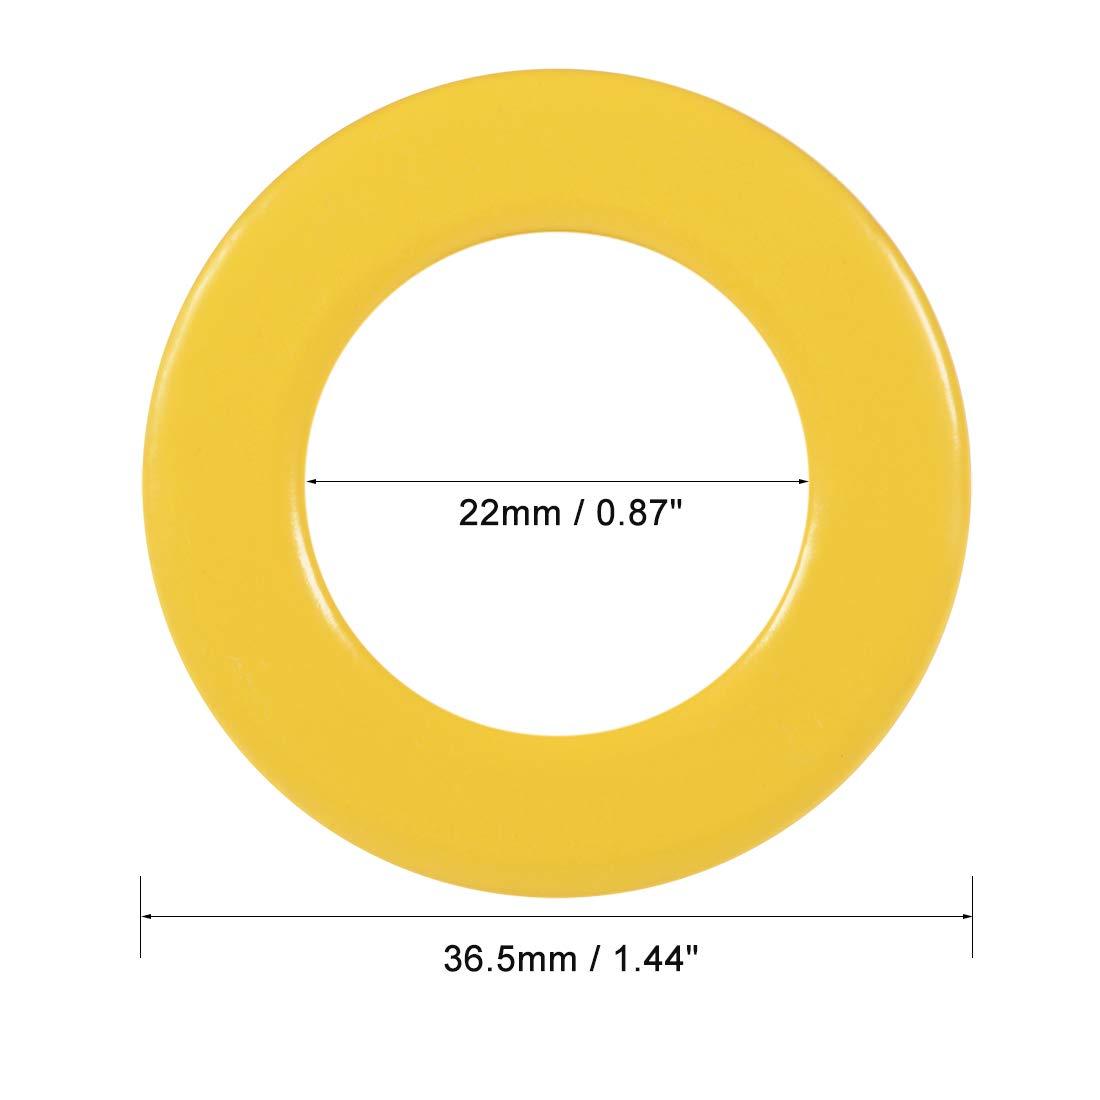 uxcell 17pcs 12 x 20.5 x 9.8mm Ferrite Chokes Ring Iron Powder Toroid Cores Yellow White a18070600ux0038